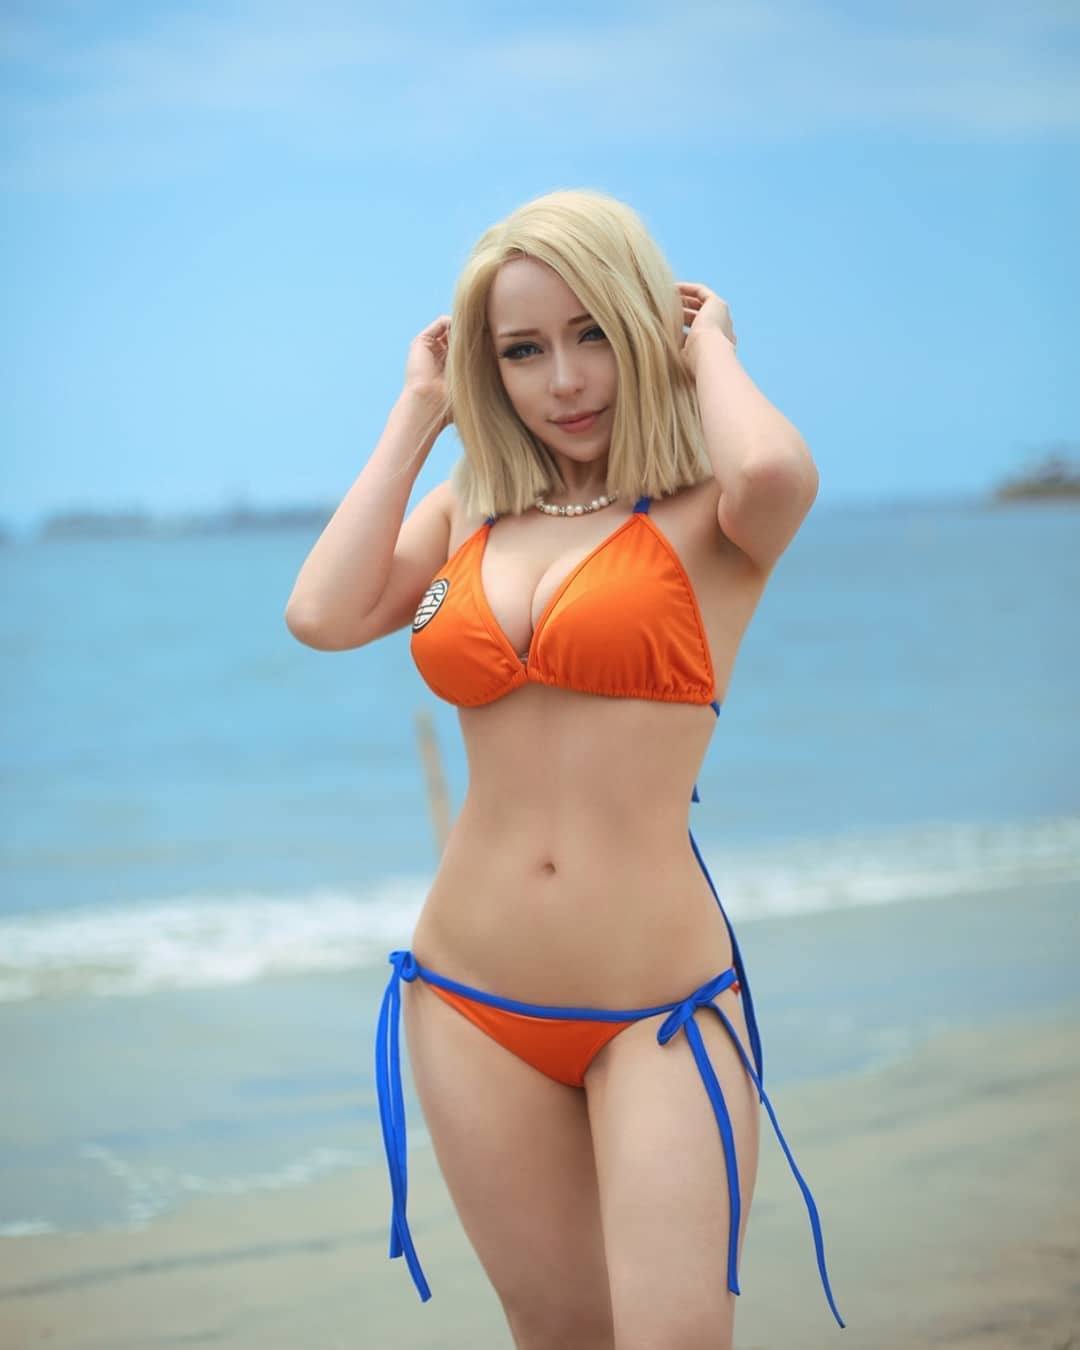 roxy wong sexy android 18 bikini cosplay 02